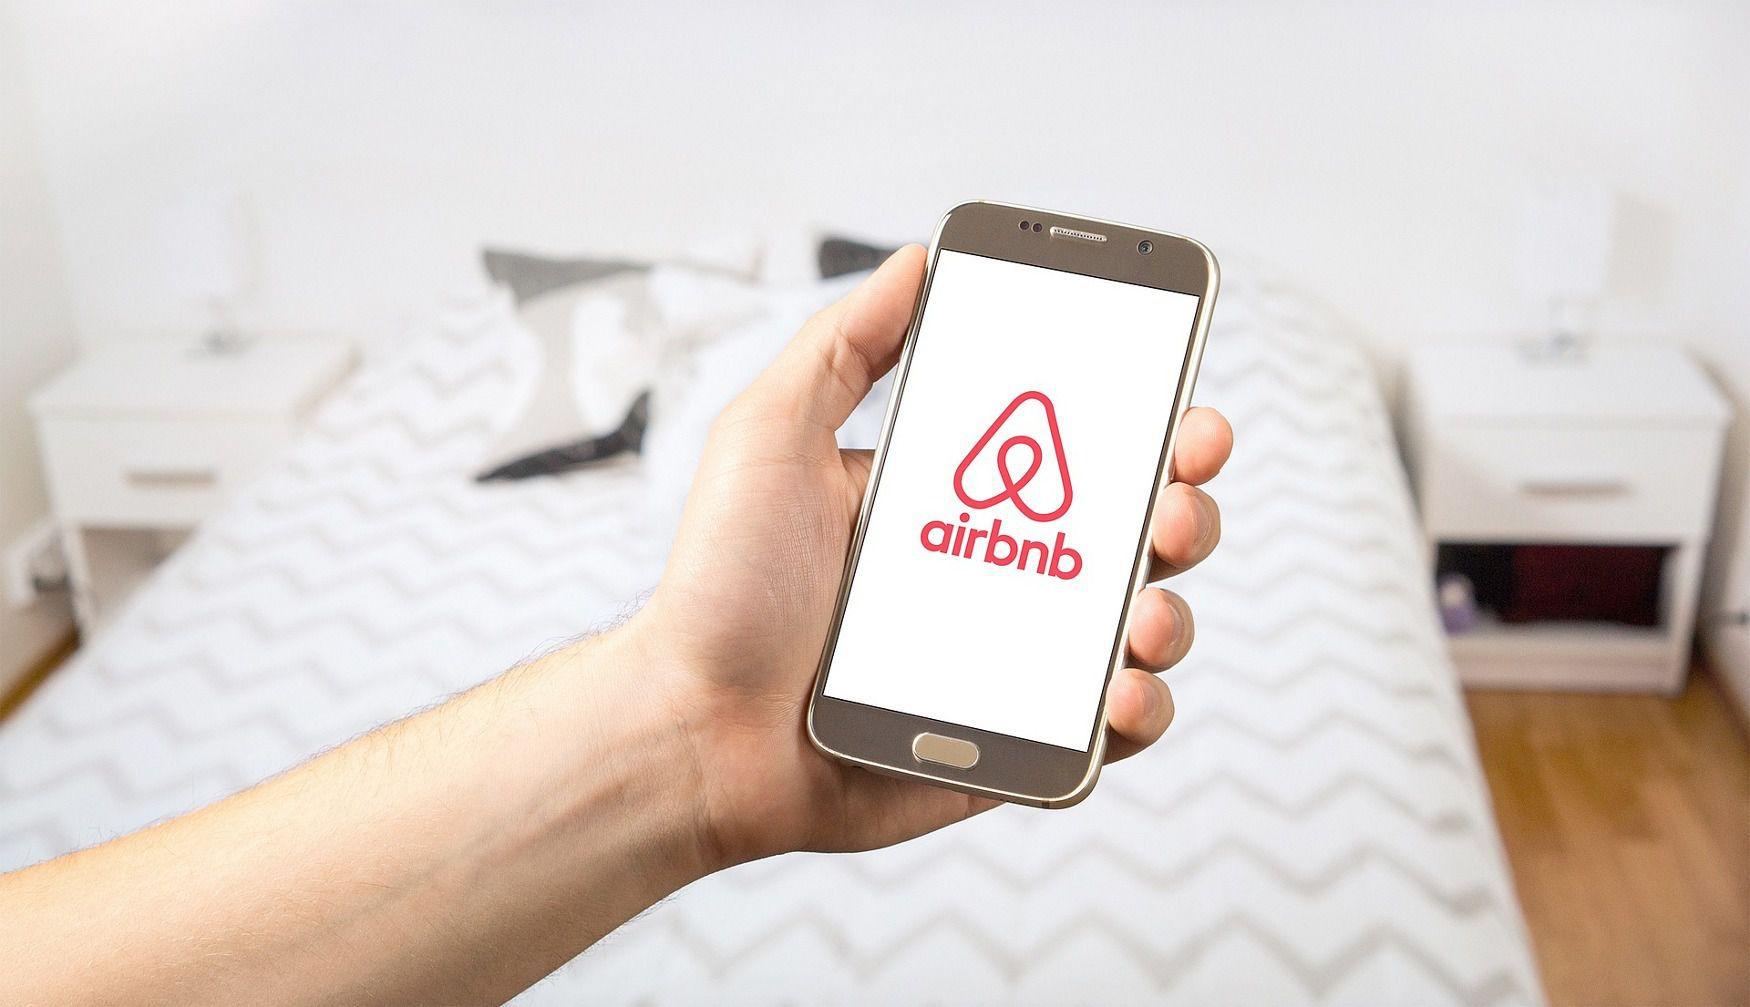 Prague 1 fights back against Airbnb-type services | Radio Prague